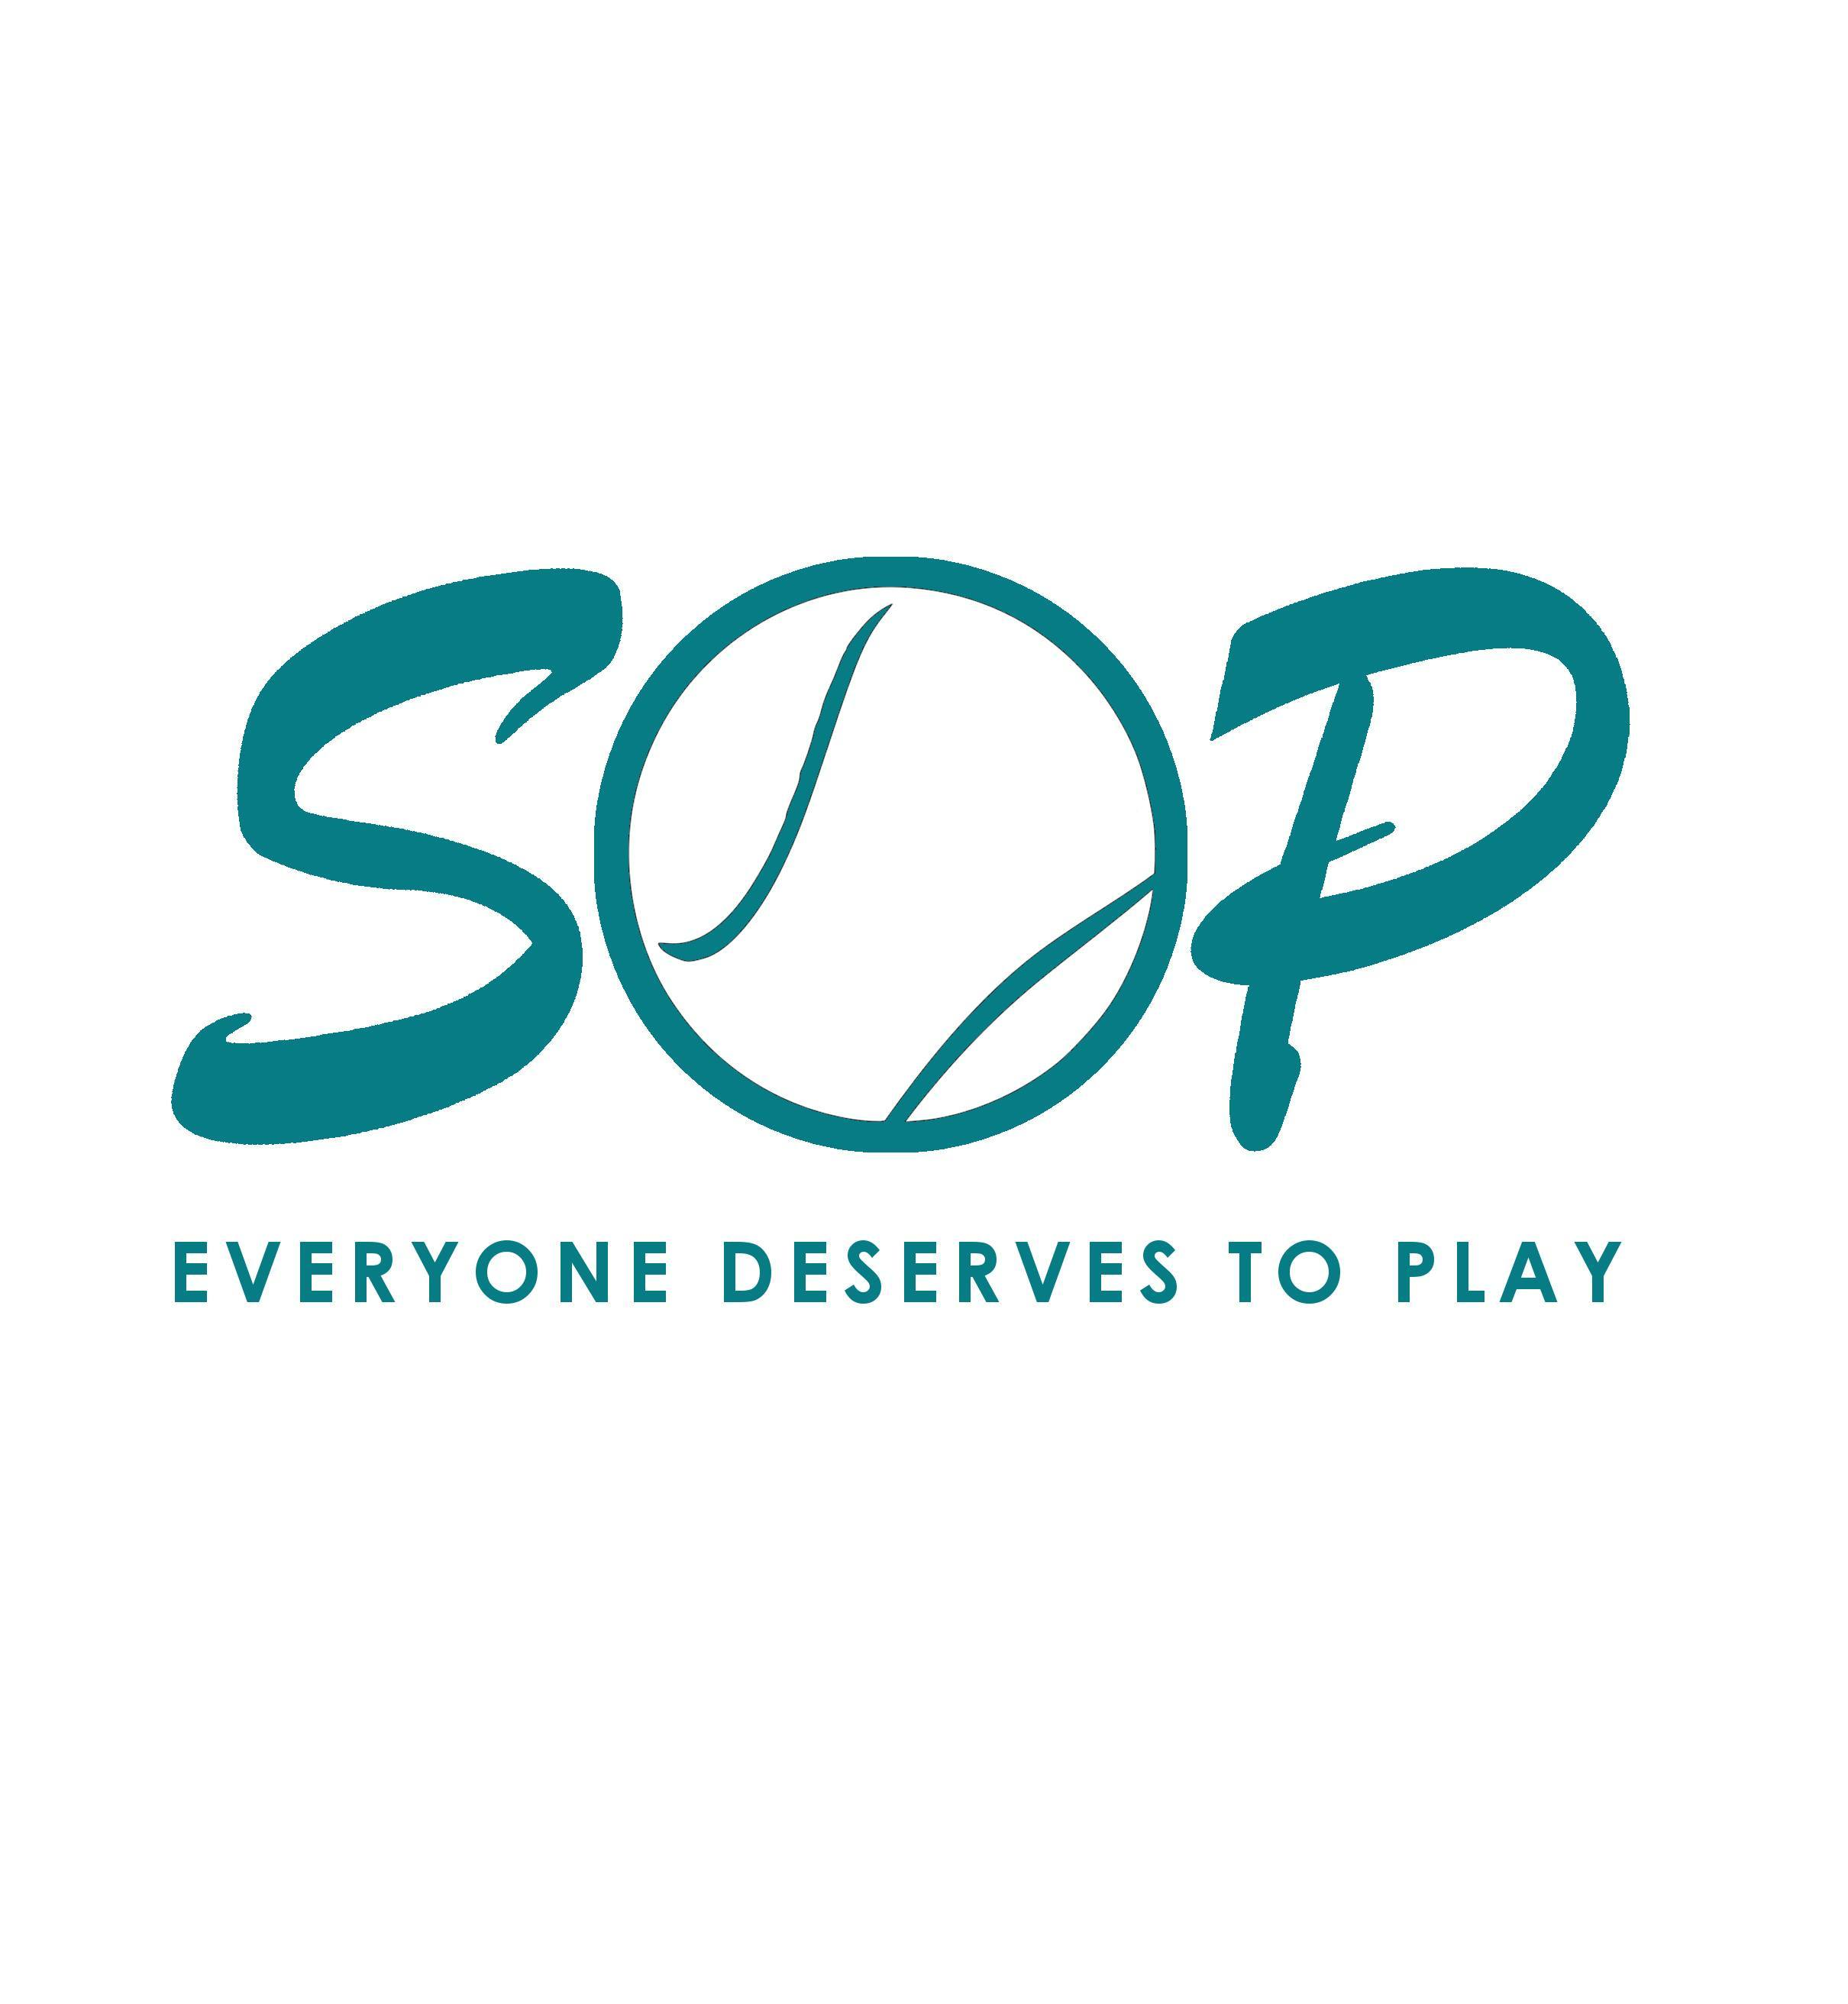 Sense of Play